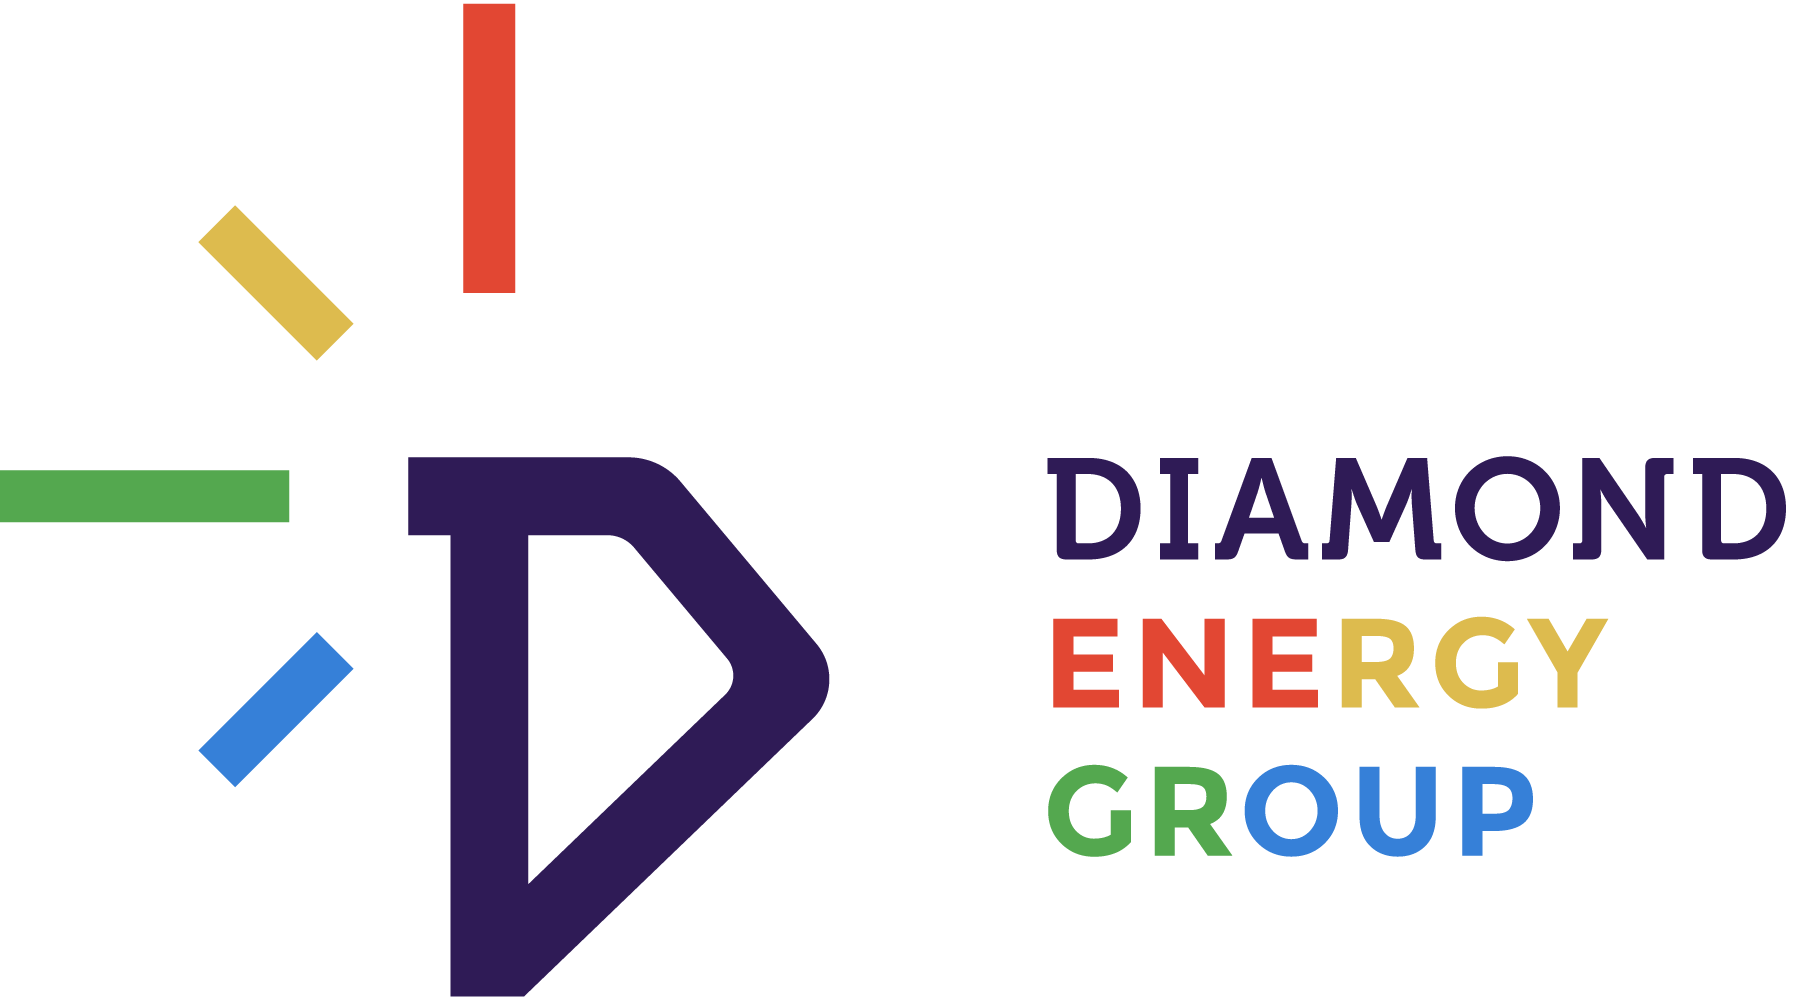 Diamond Energy Group